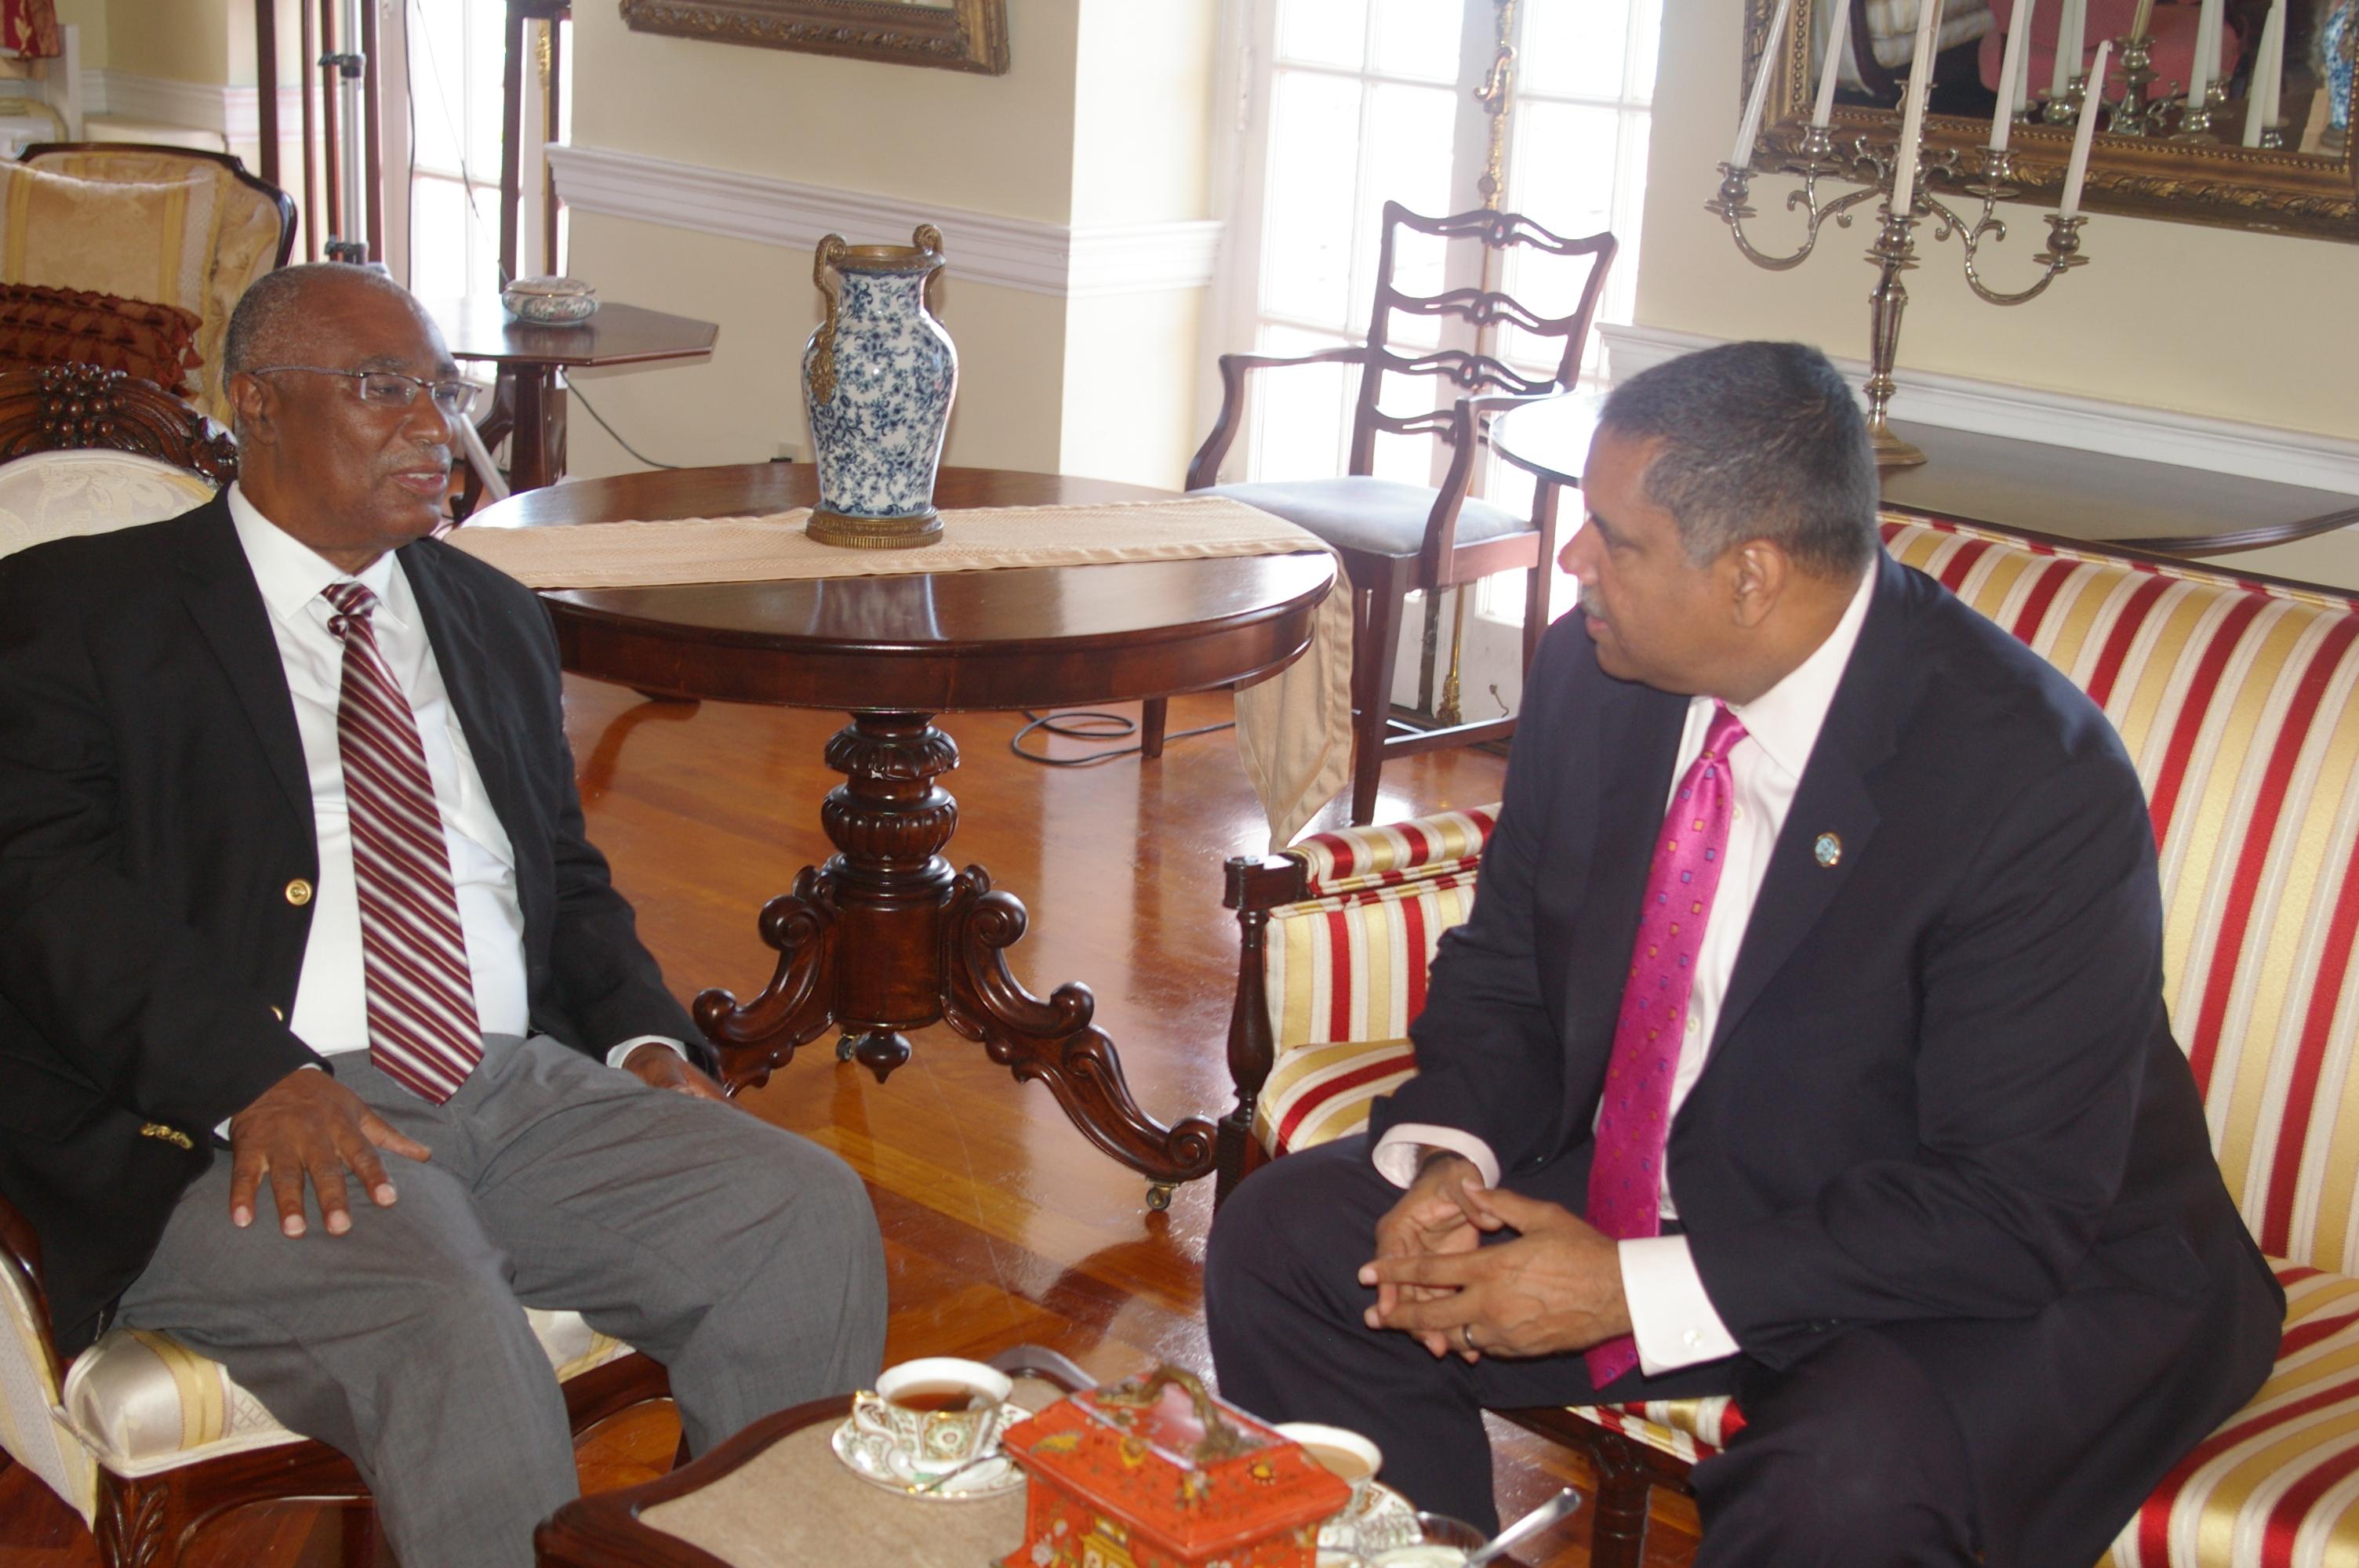 Premier of Nevis, the Hon. Joseph Parry with Governor of the United States Virgin Islands (USVI), the Hon. John P. de Jongh